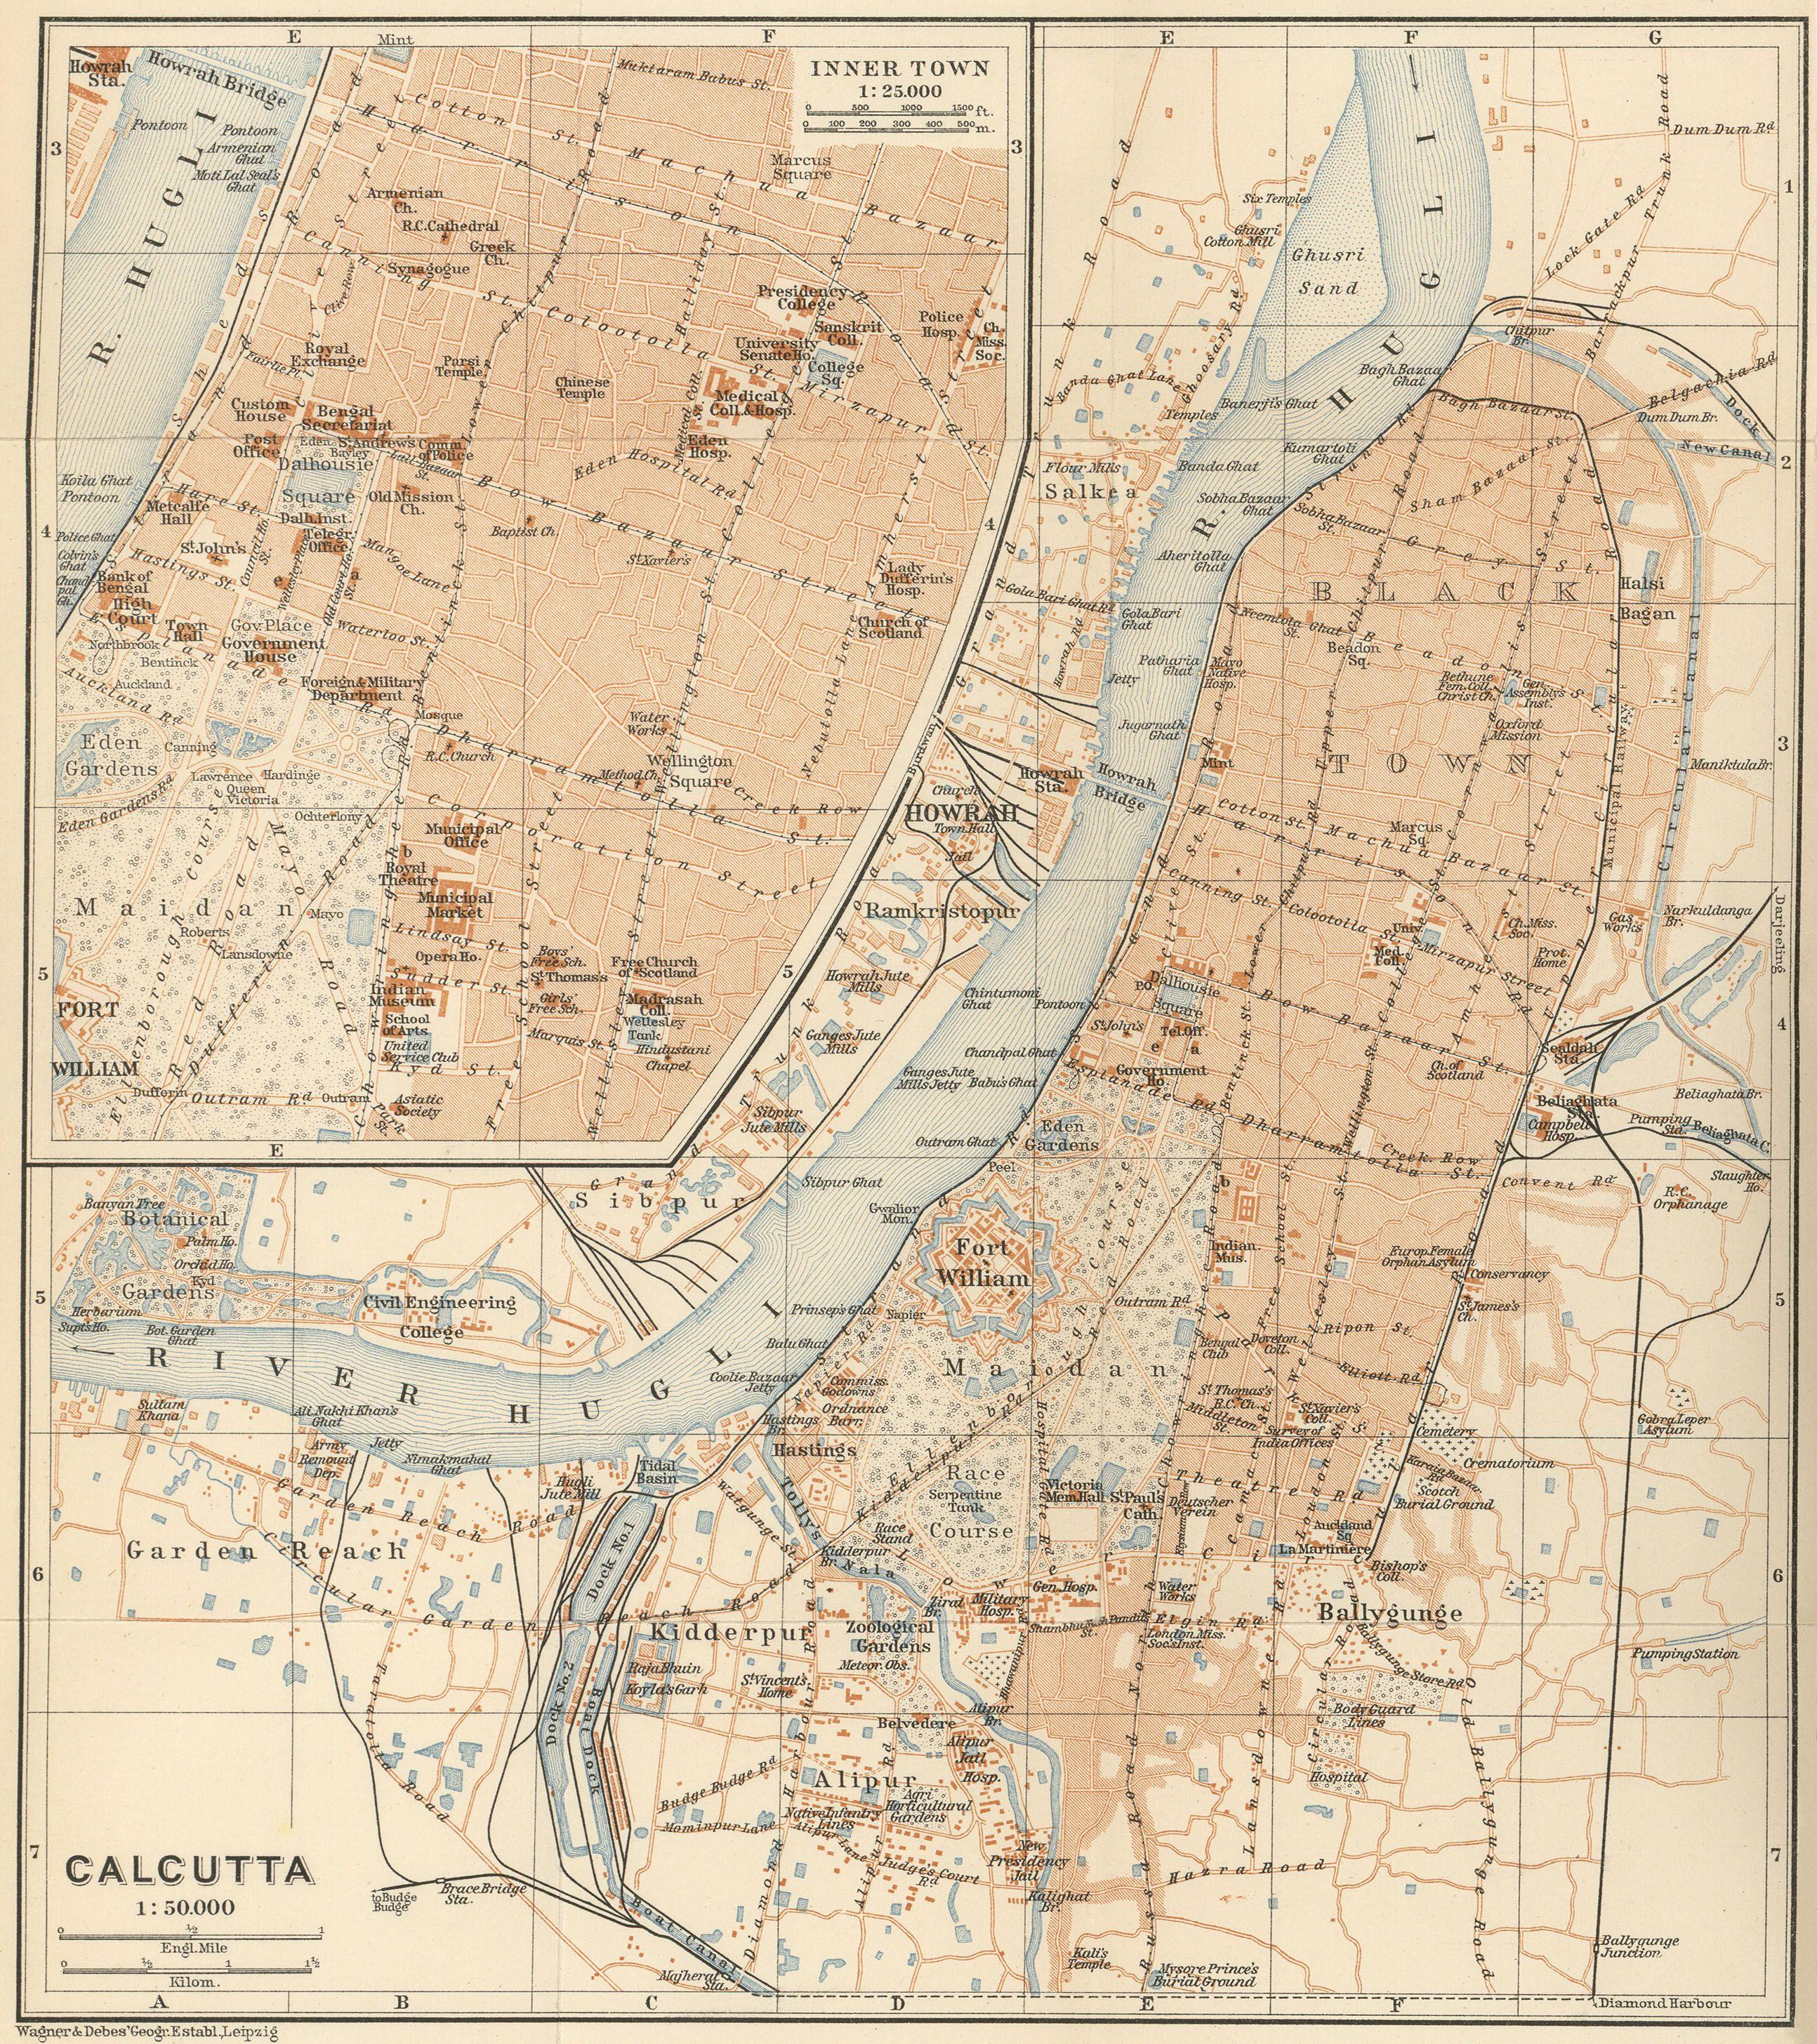 Calcutta, India 1914   Maps in 2019   Kolkata, India, Indian on new town kolkata map, bombay calcutta on a map, bengali calcutta map, kolkata west bengal on a map, asia calcutta map, kolkata calcutta diagram, india calcutta map,